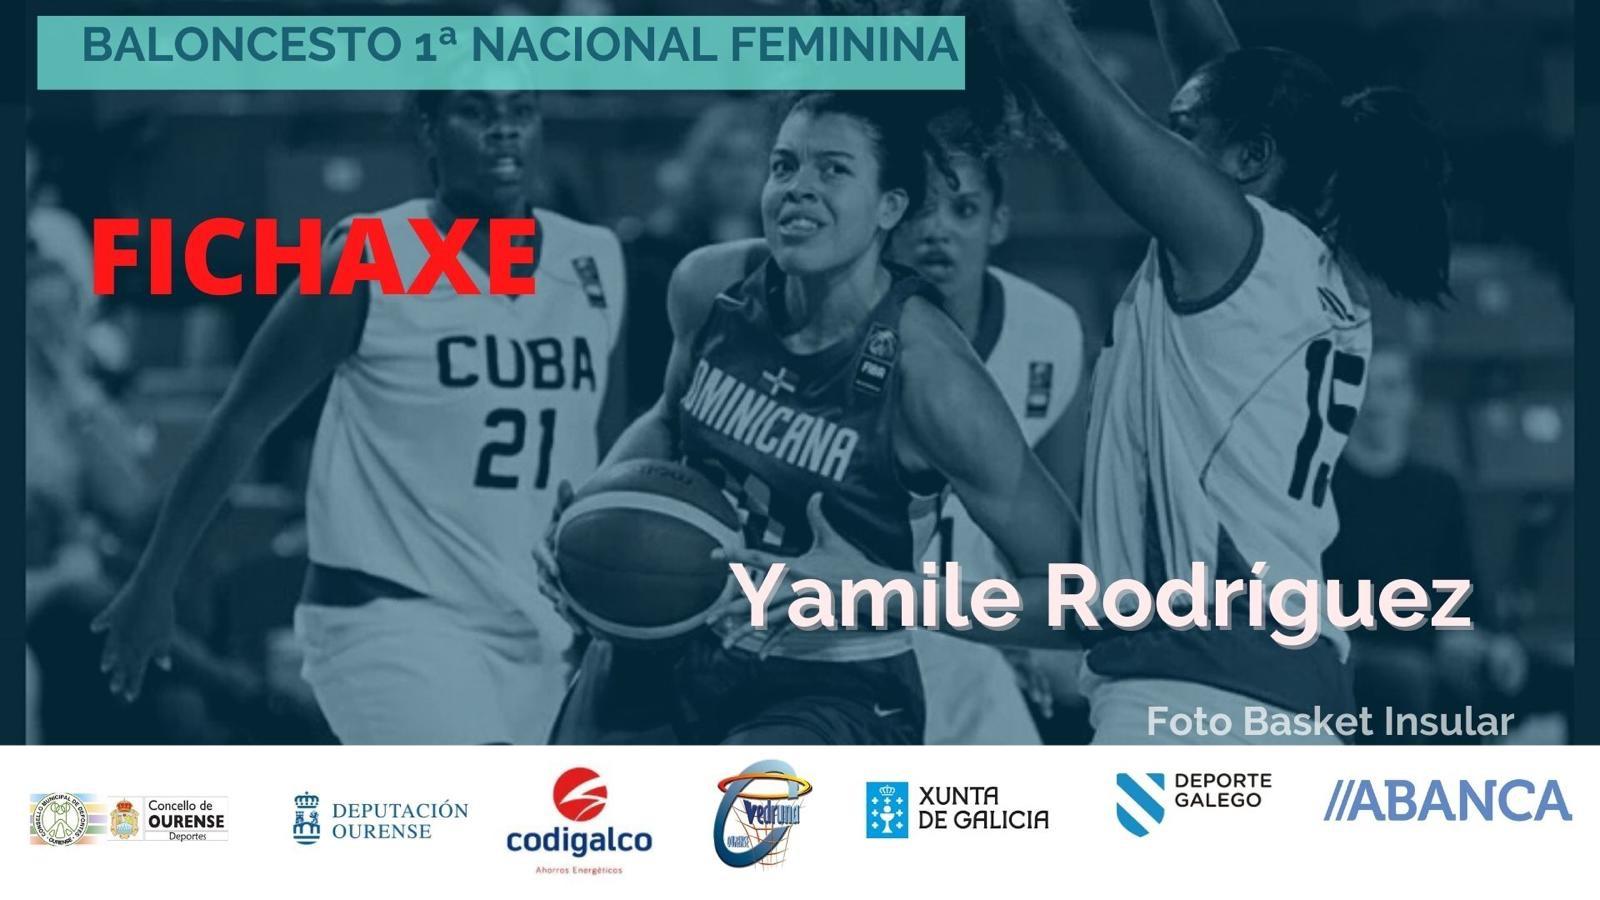 Yamilé Rodríguez ficha por el Codigalco Carmelitas